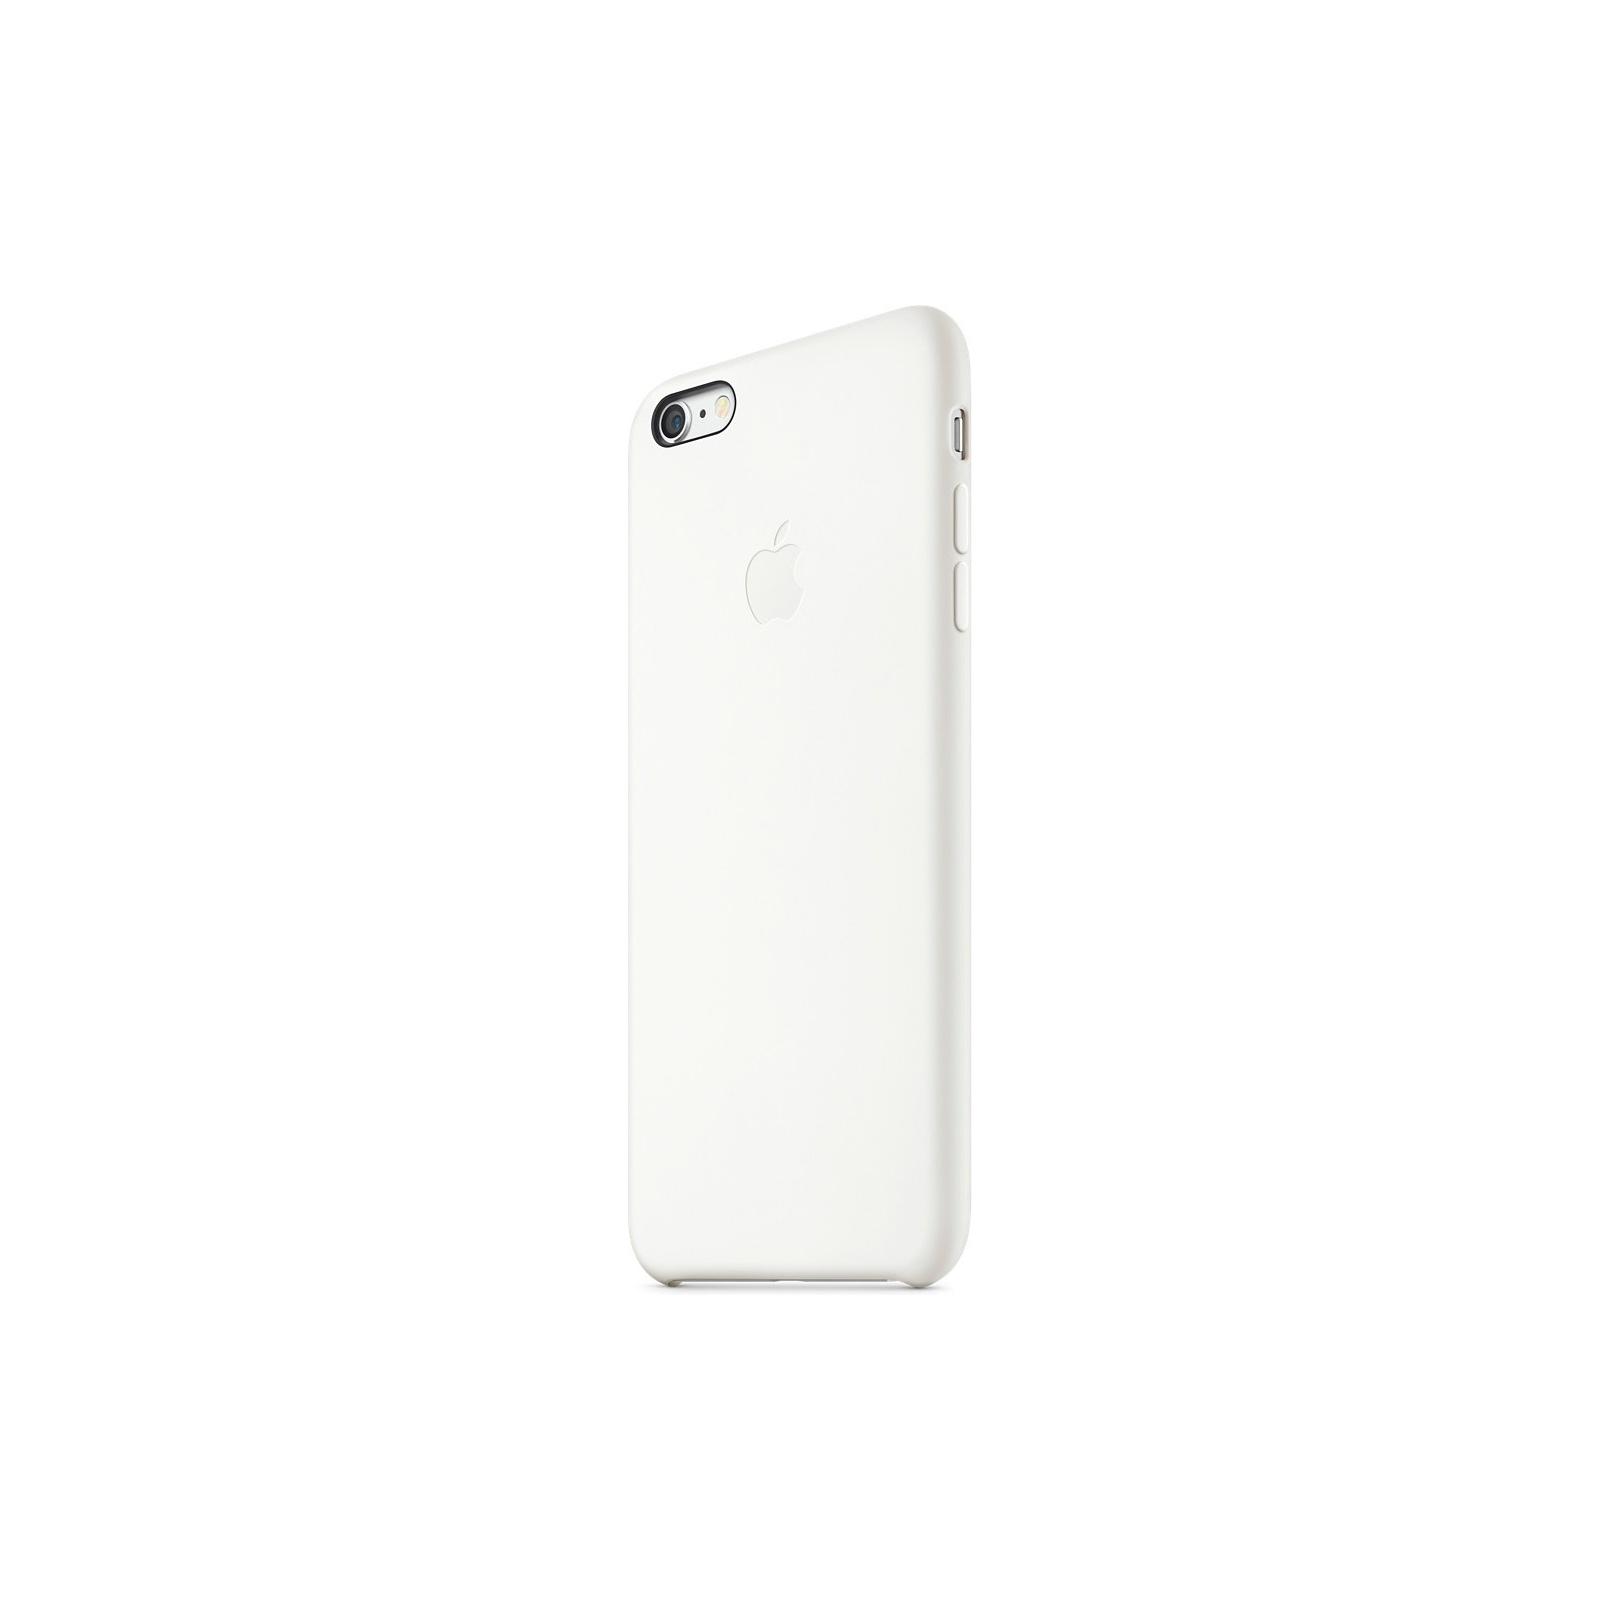 Чехол для моб. телефона Apple для iPhone 6 /white (MGRF2ZM/A) изображение 2